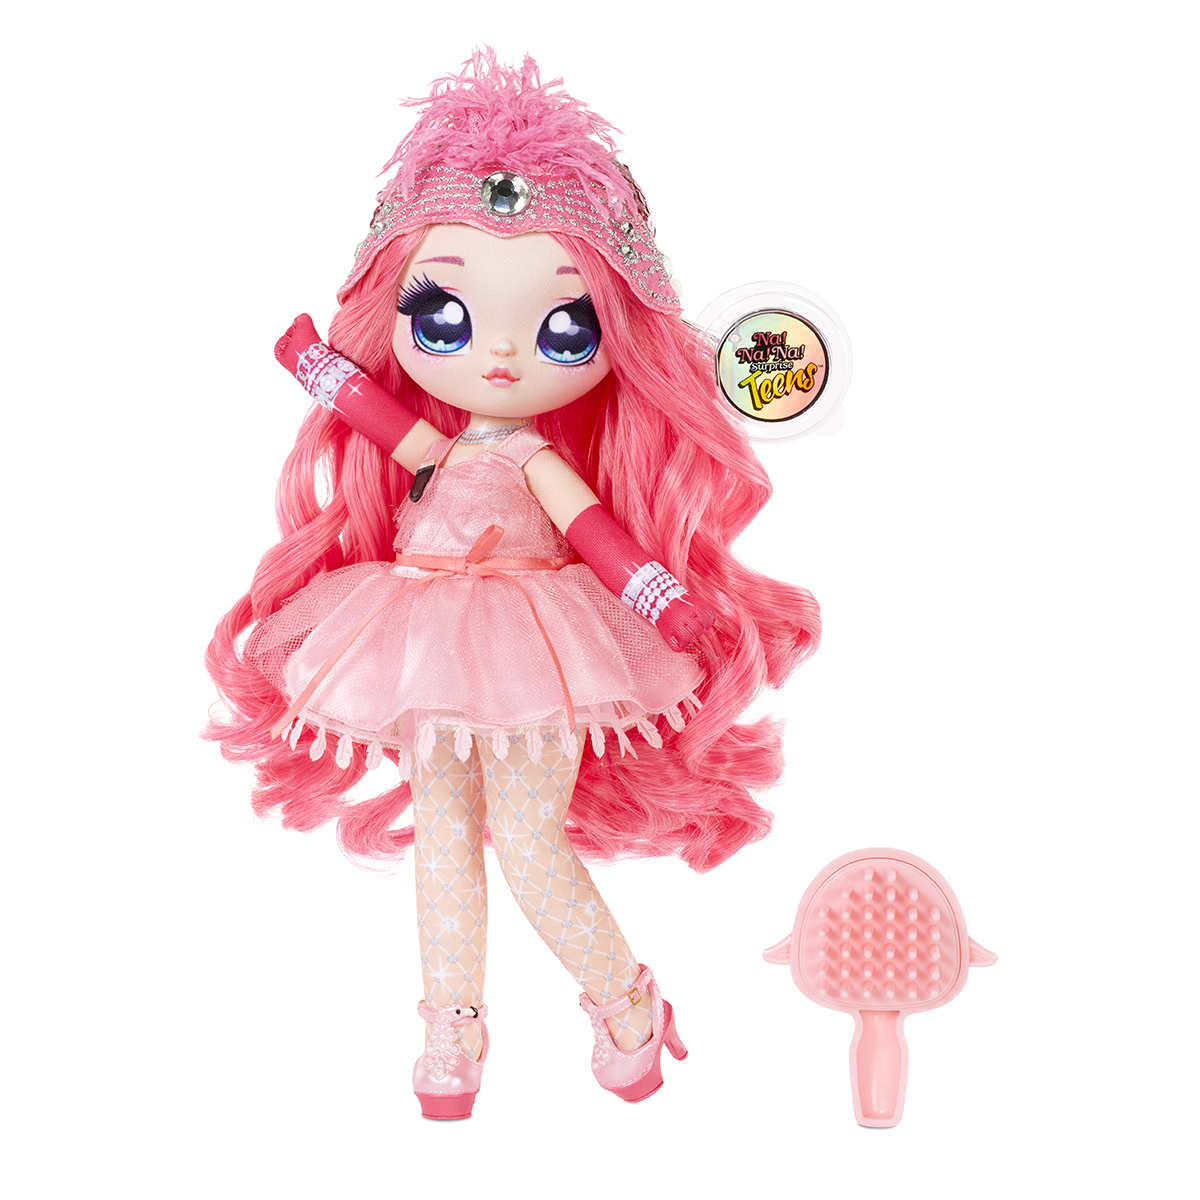 Na Na Na Surprise Teens, S1, Papusa Fashion Coco Von Sparkle, 572596